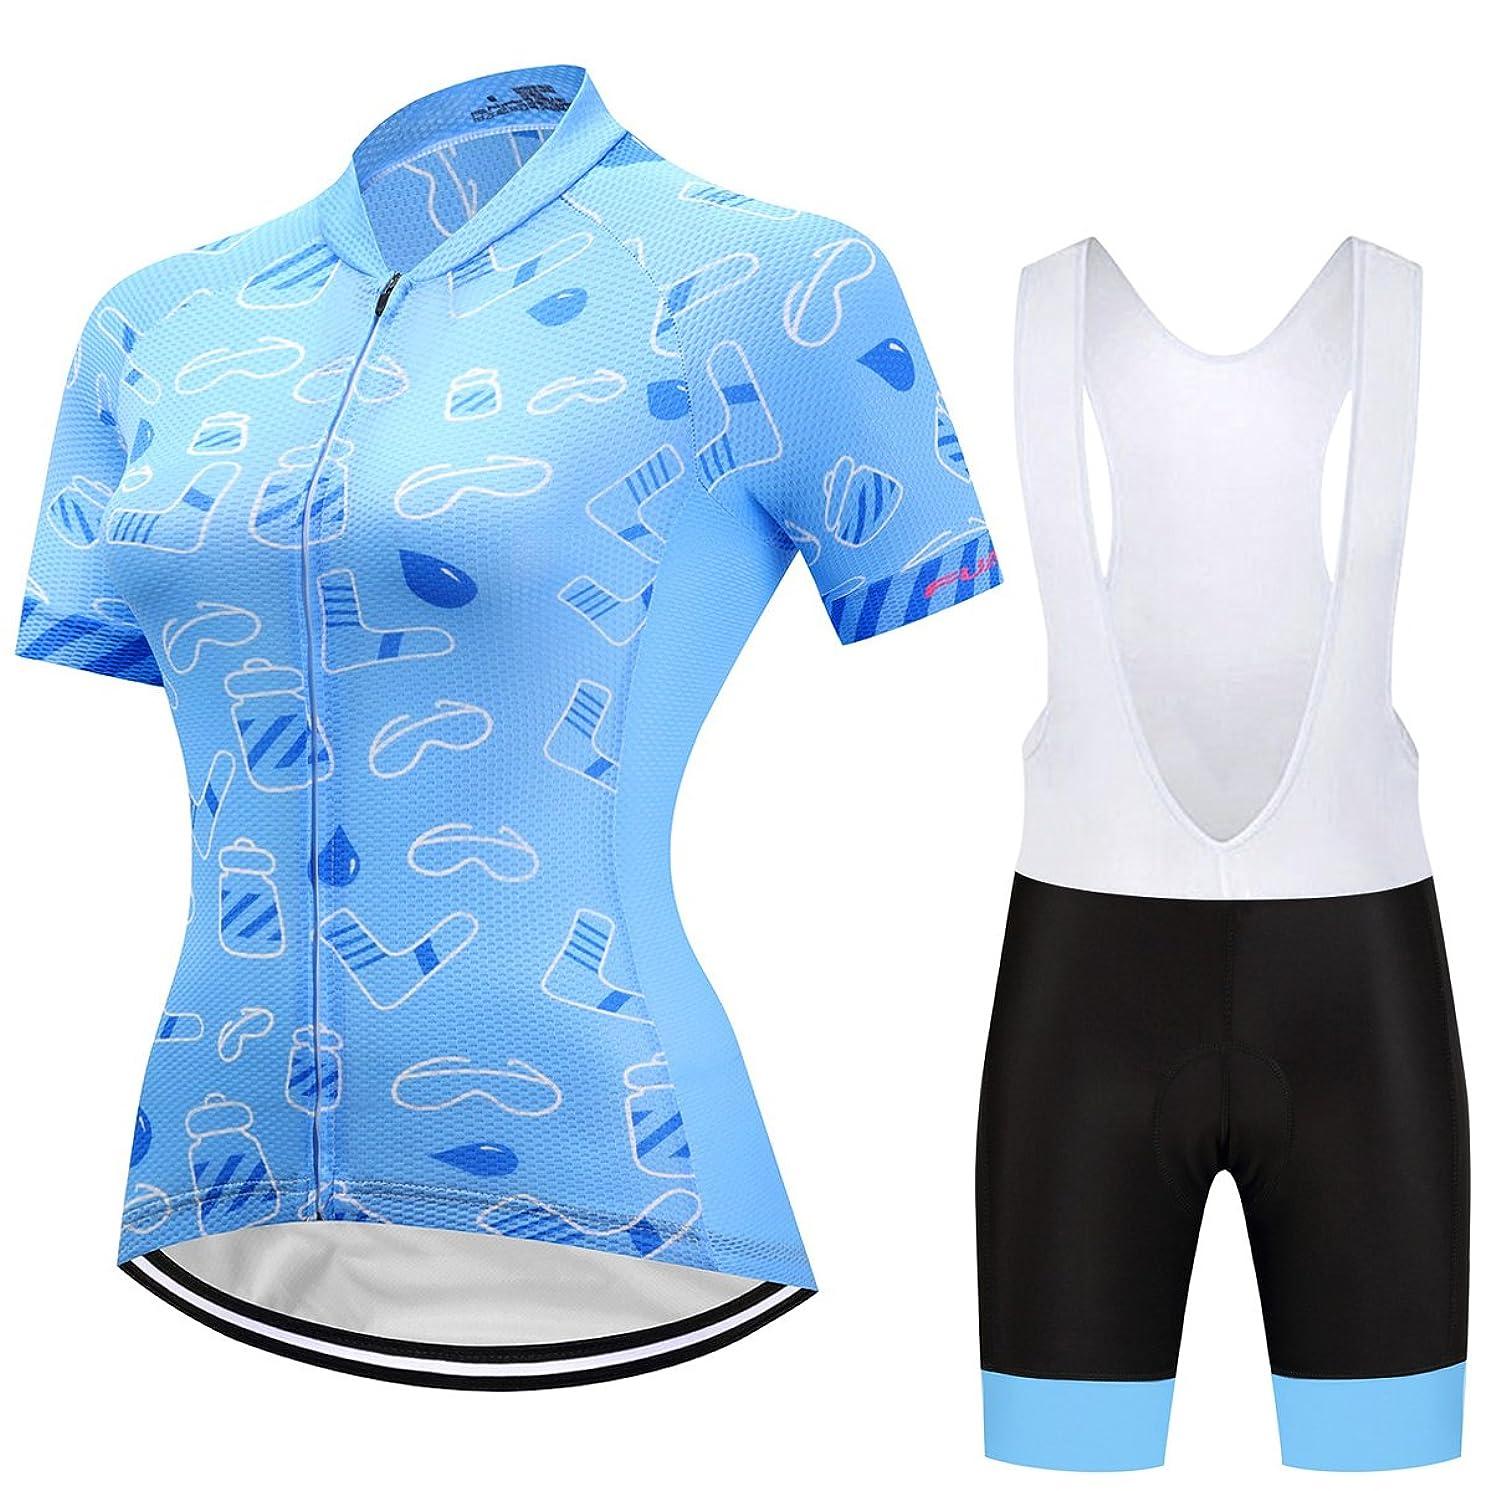 Women's Cycling Jersey Beautiful Bike Full-Zip Short Sleeve Bicycle Clothing Shirt Jacket Summer Padded Pants Set Outfit